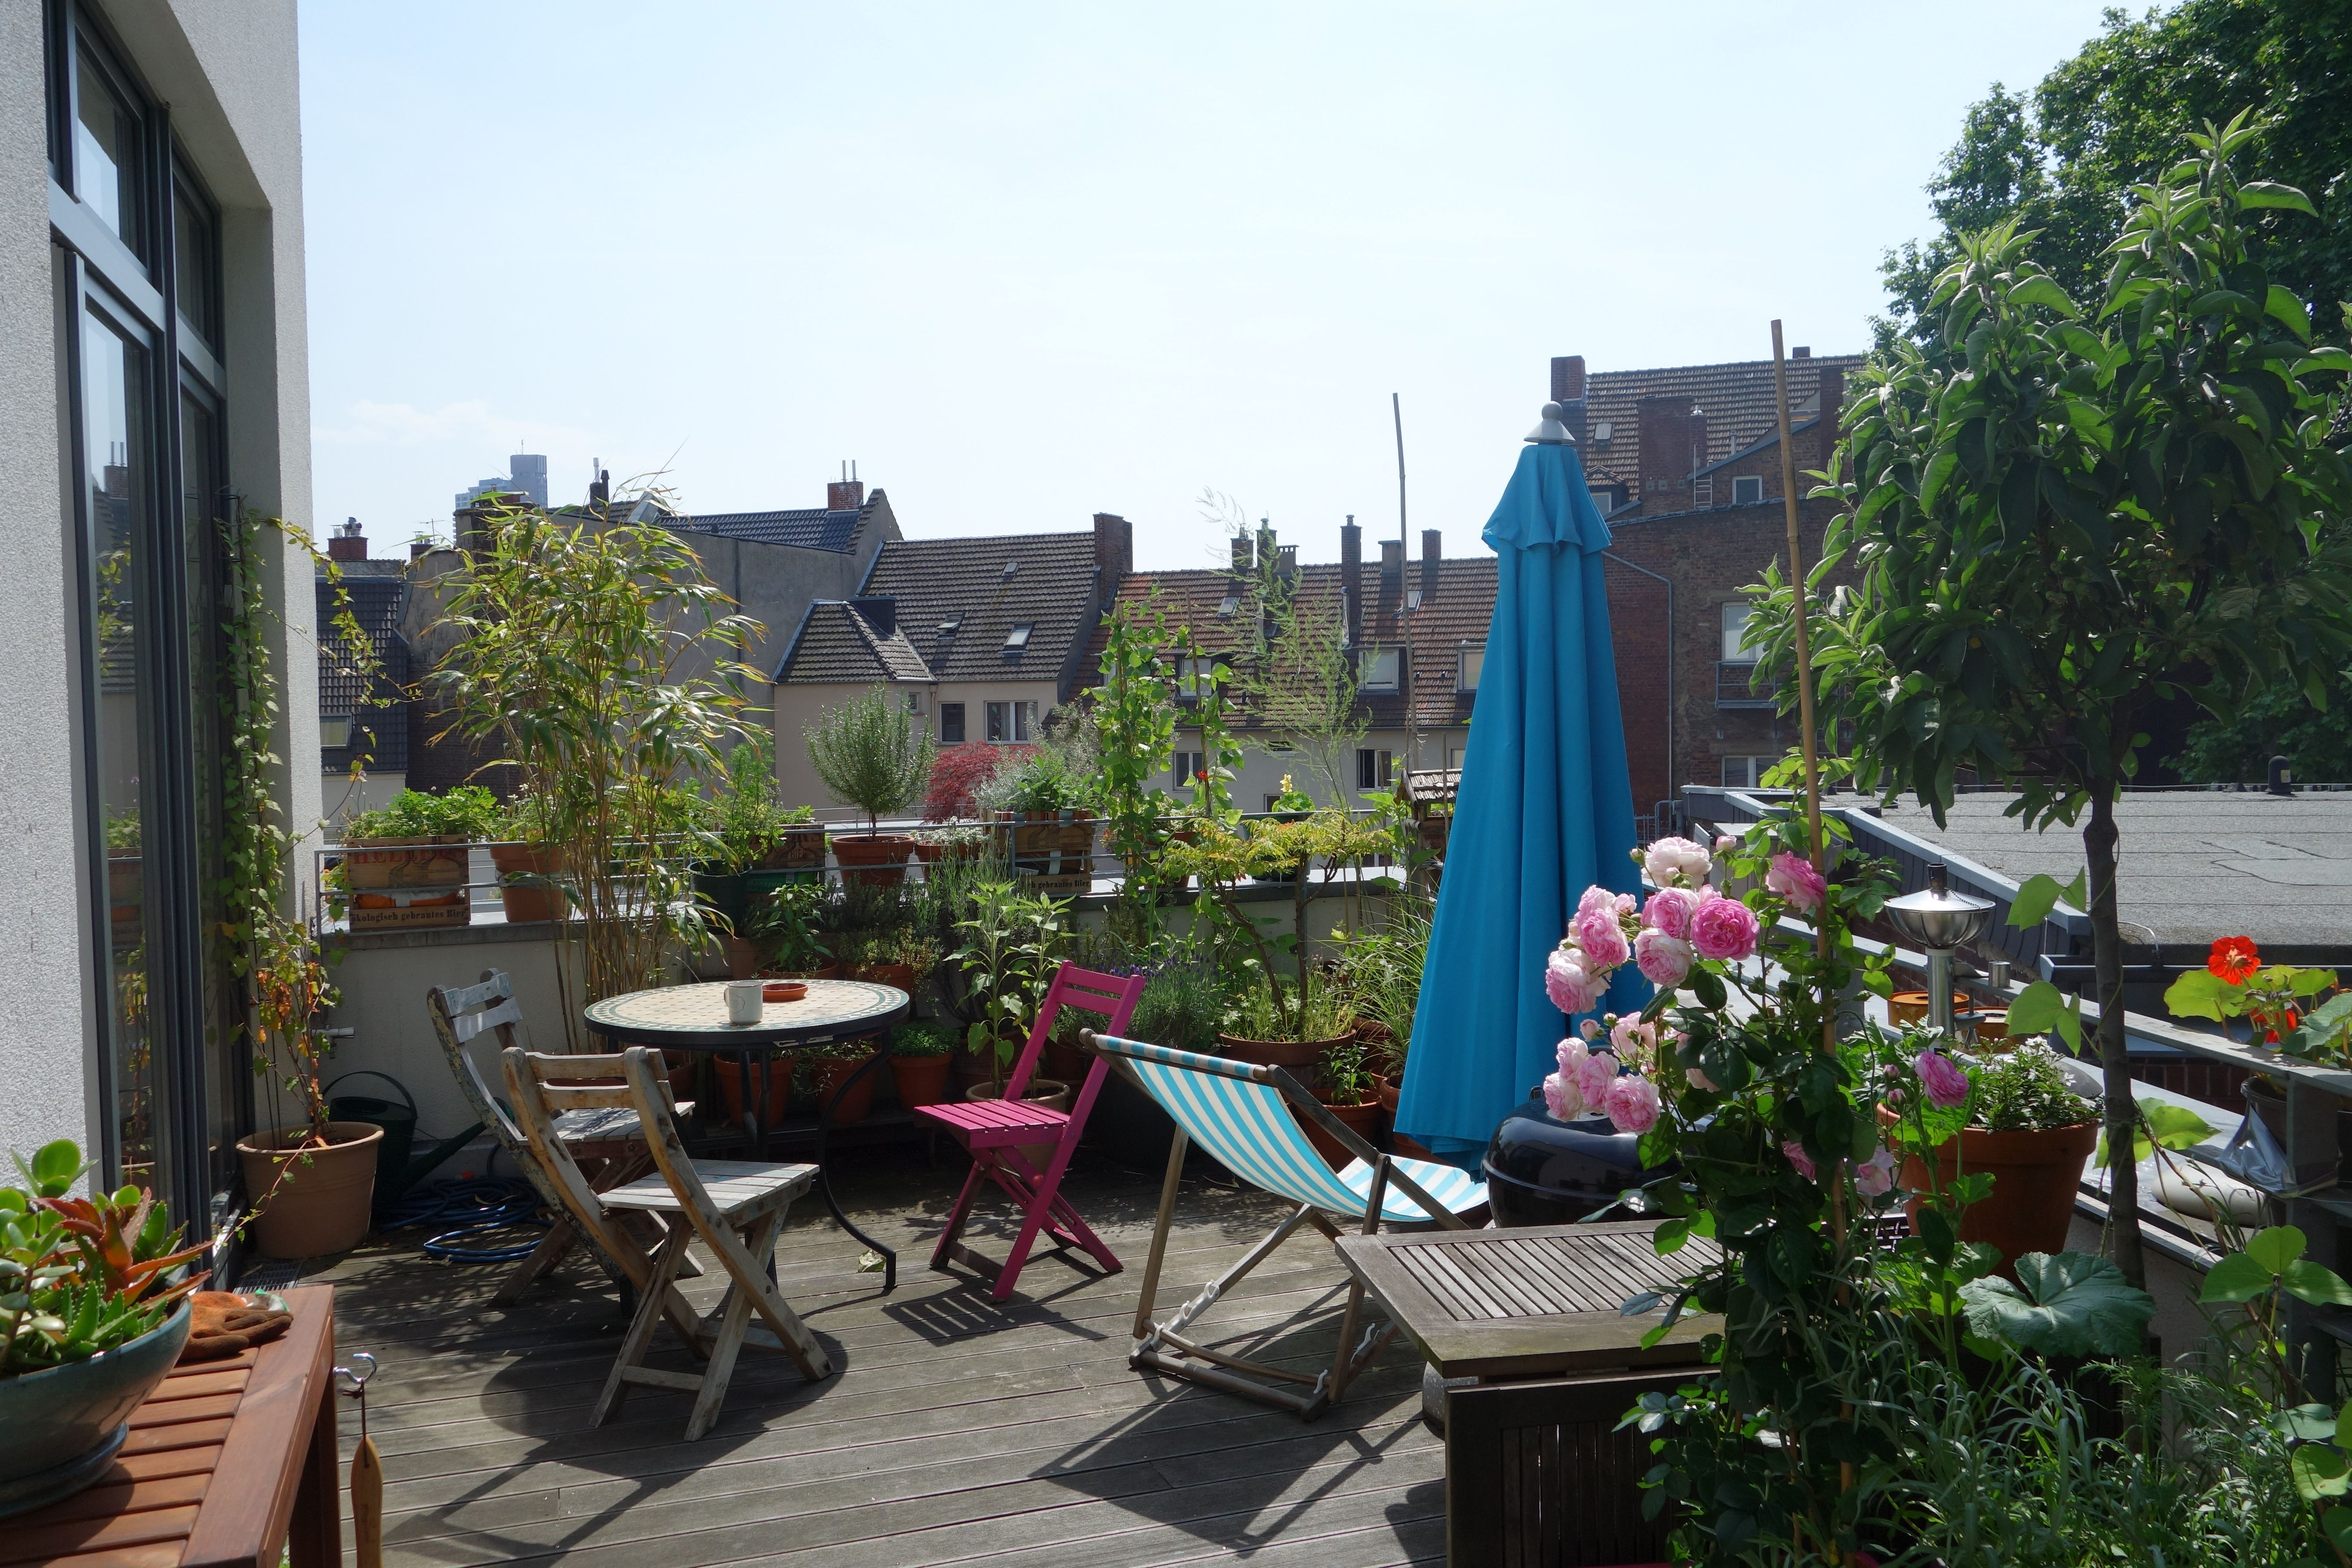 Dachterrasse, Balkon, Begrünung   Gardening Ideas   Pinterest ...